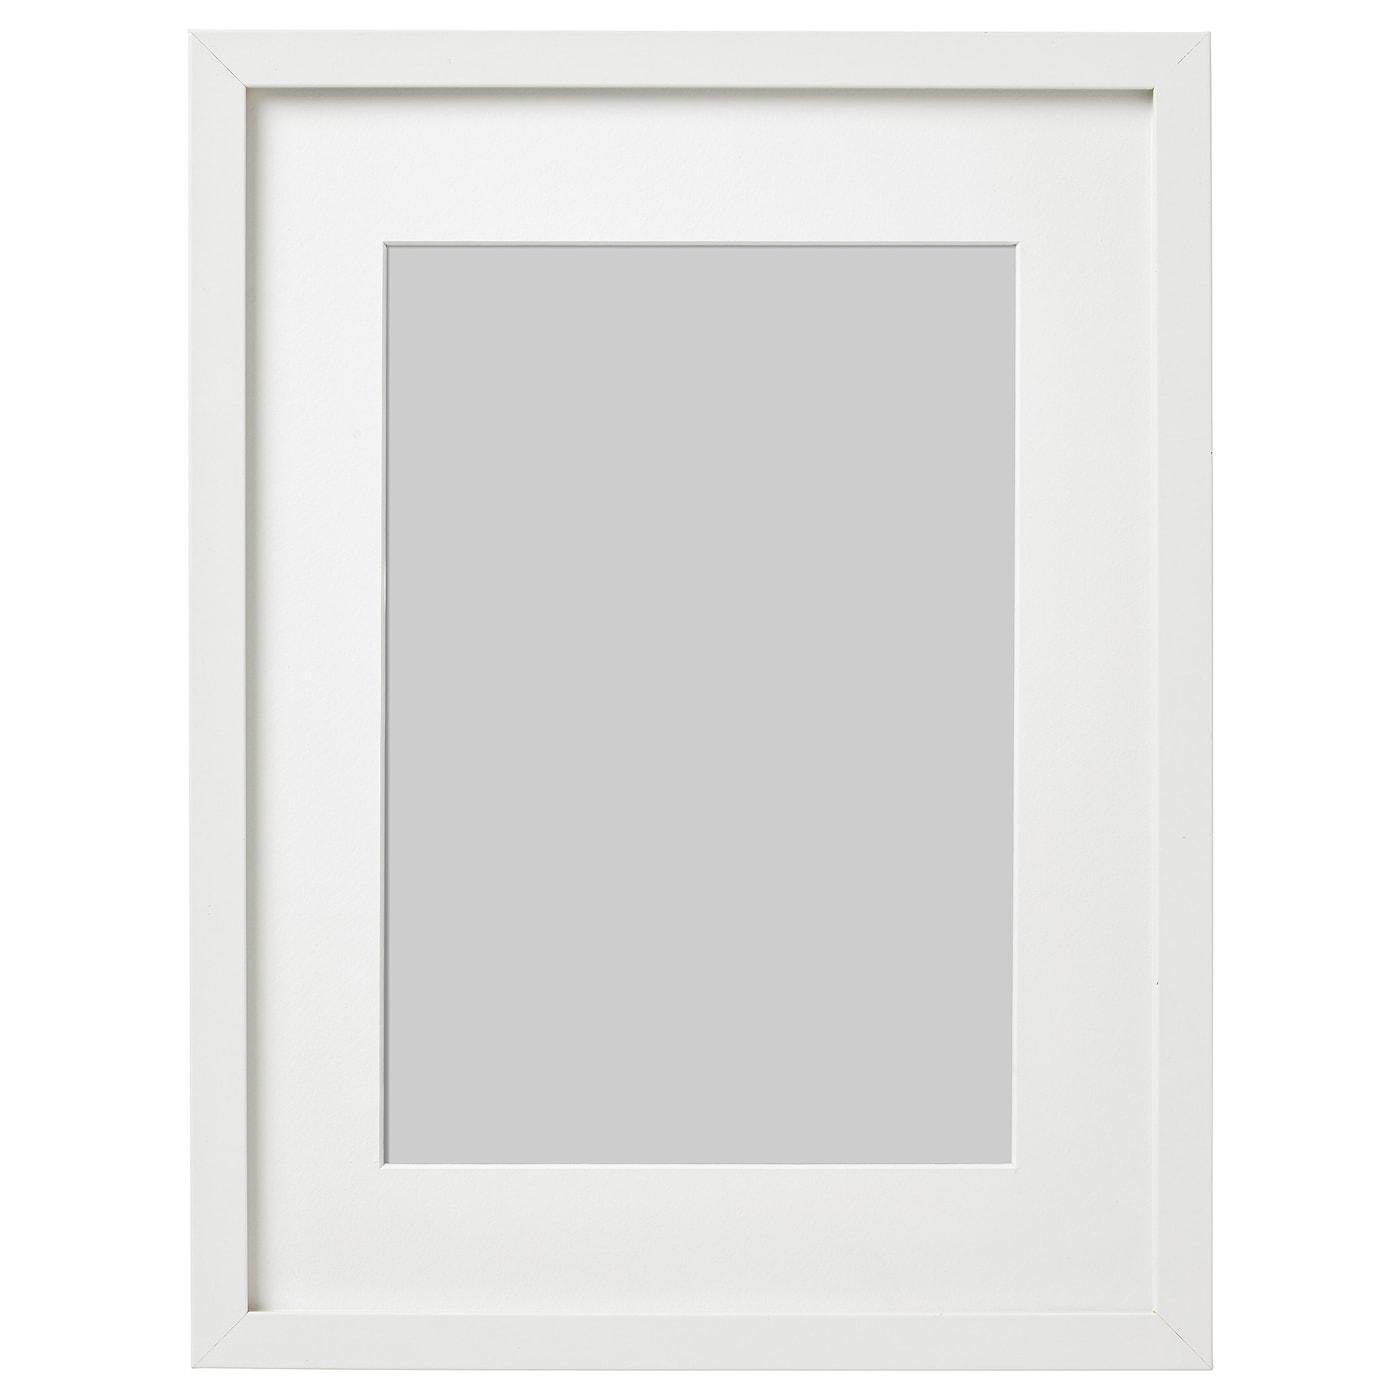 ribba cadre blanc 30 x 40 cm ikea. Black Bedroom Furniture Sets. Home Design Ideas